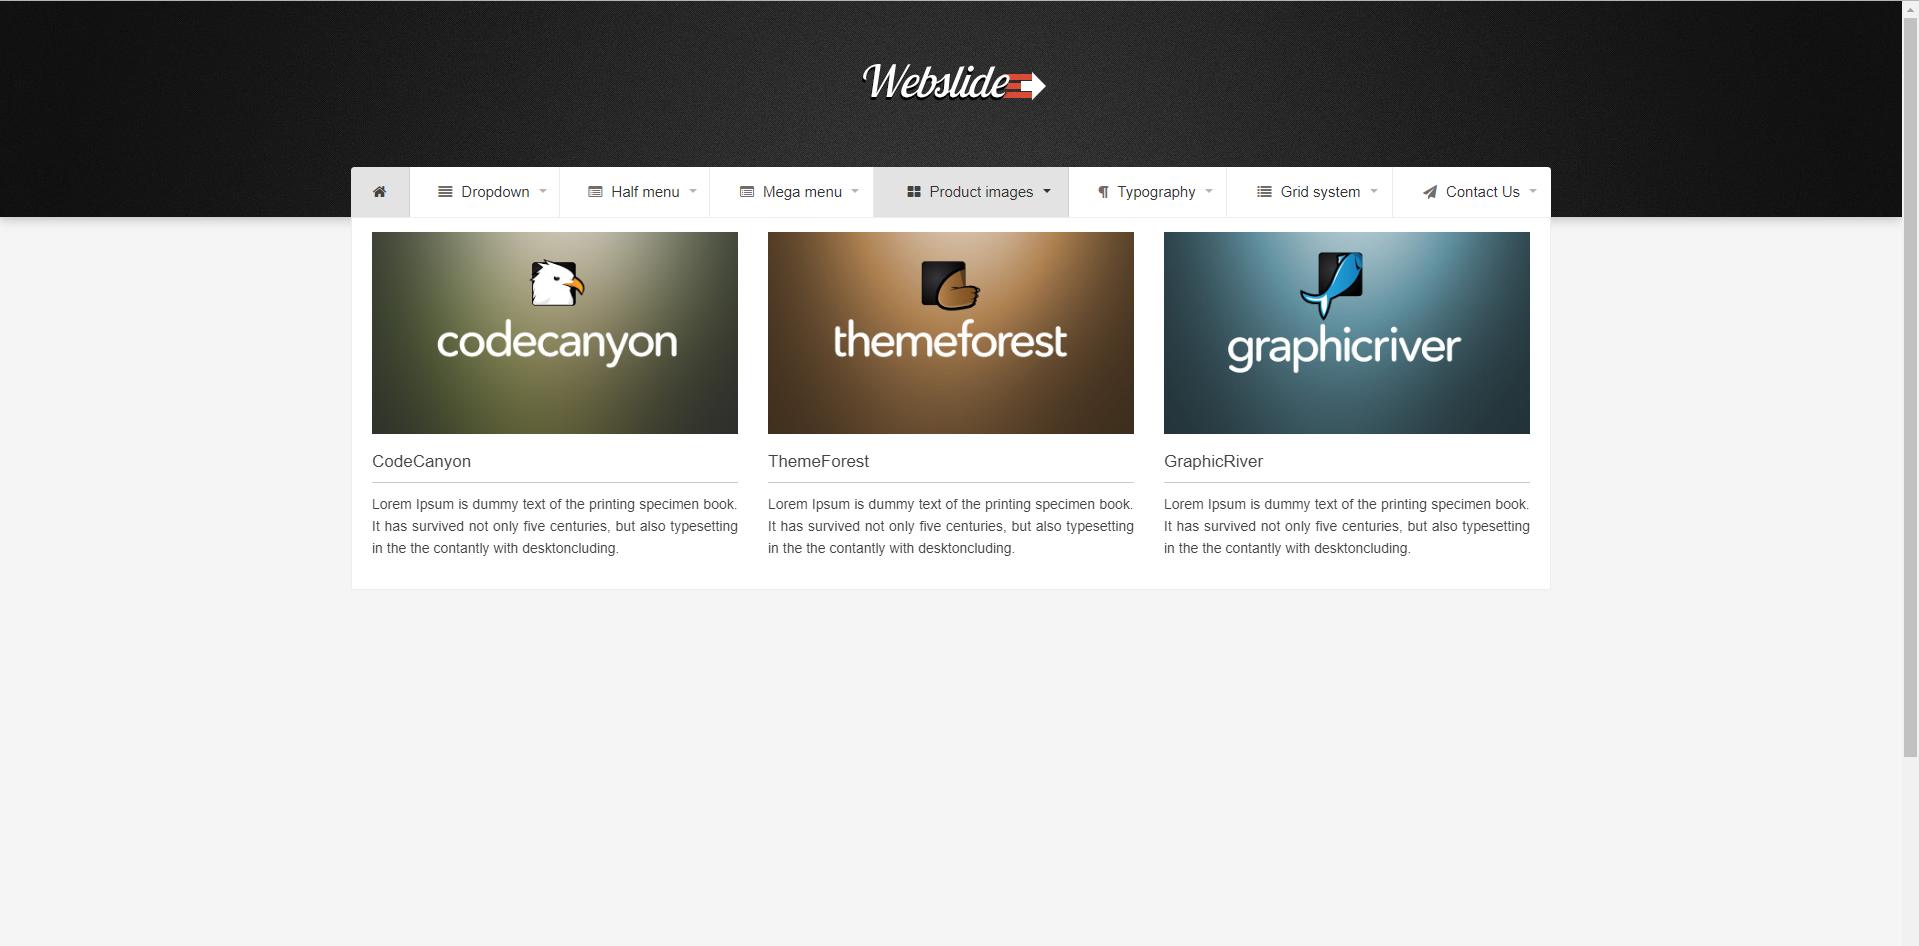 Web Slide - Bootstrap 4 Mega Menu Responsive | Chicken Food Photos